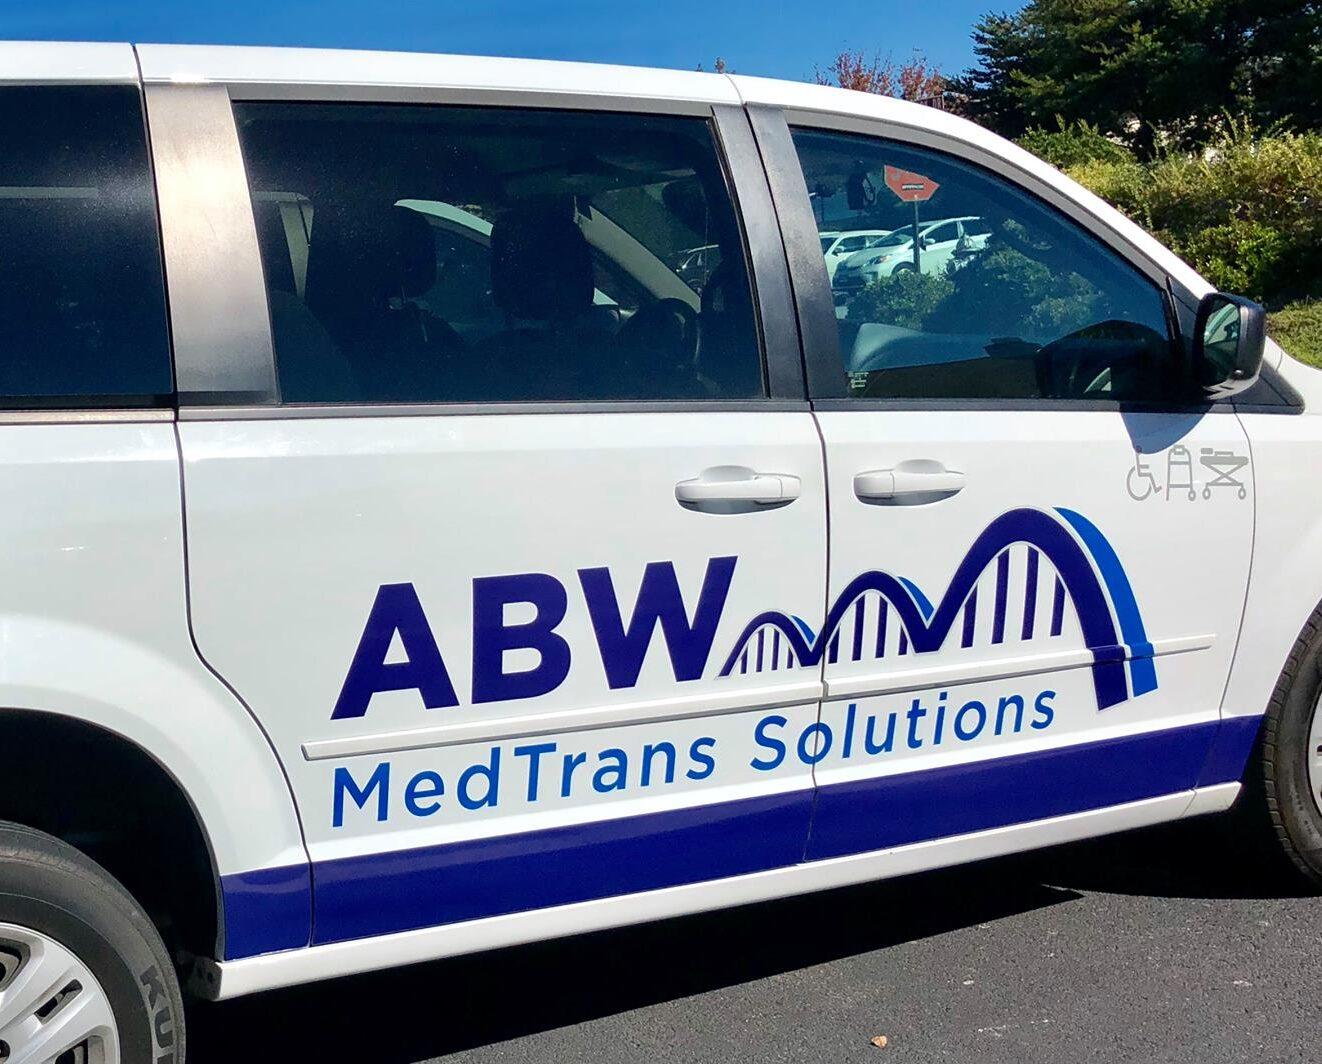 ABW MedTrans Solutions